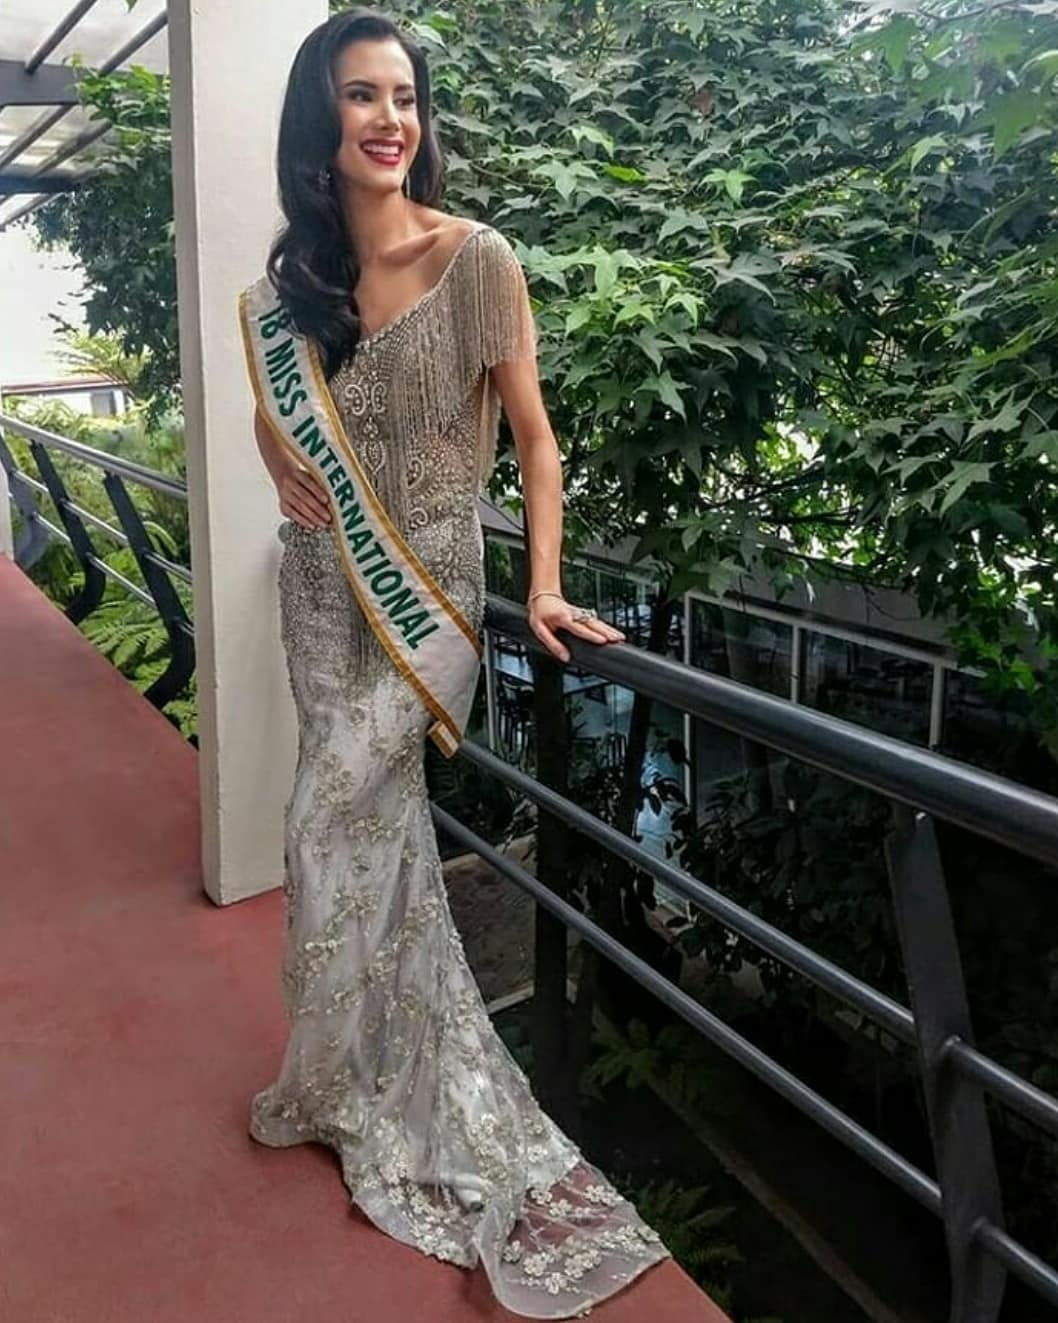 miss international 2018 visitando mexico para final de mexicana universal 2019. Zt7zdcm7